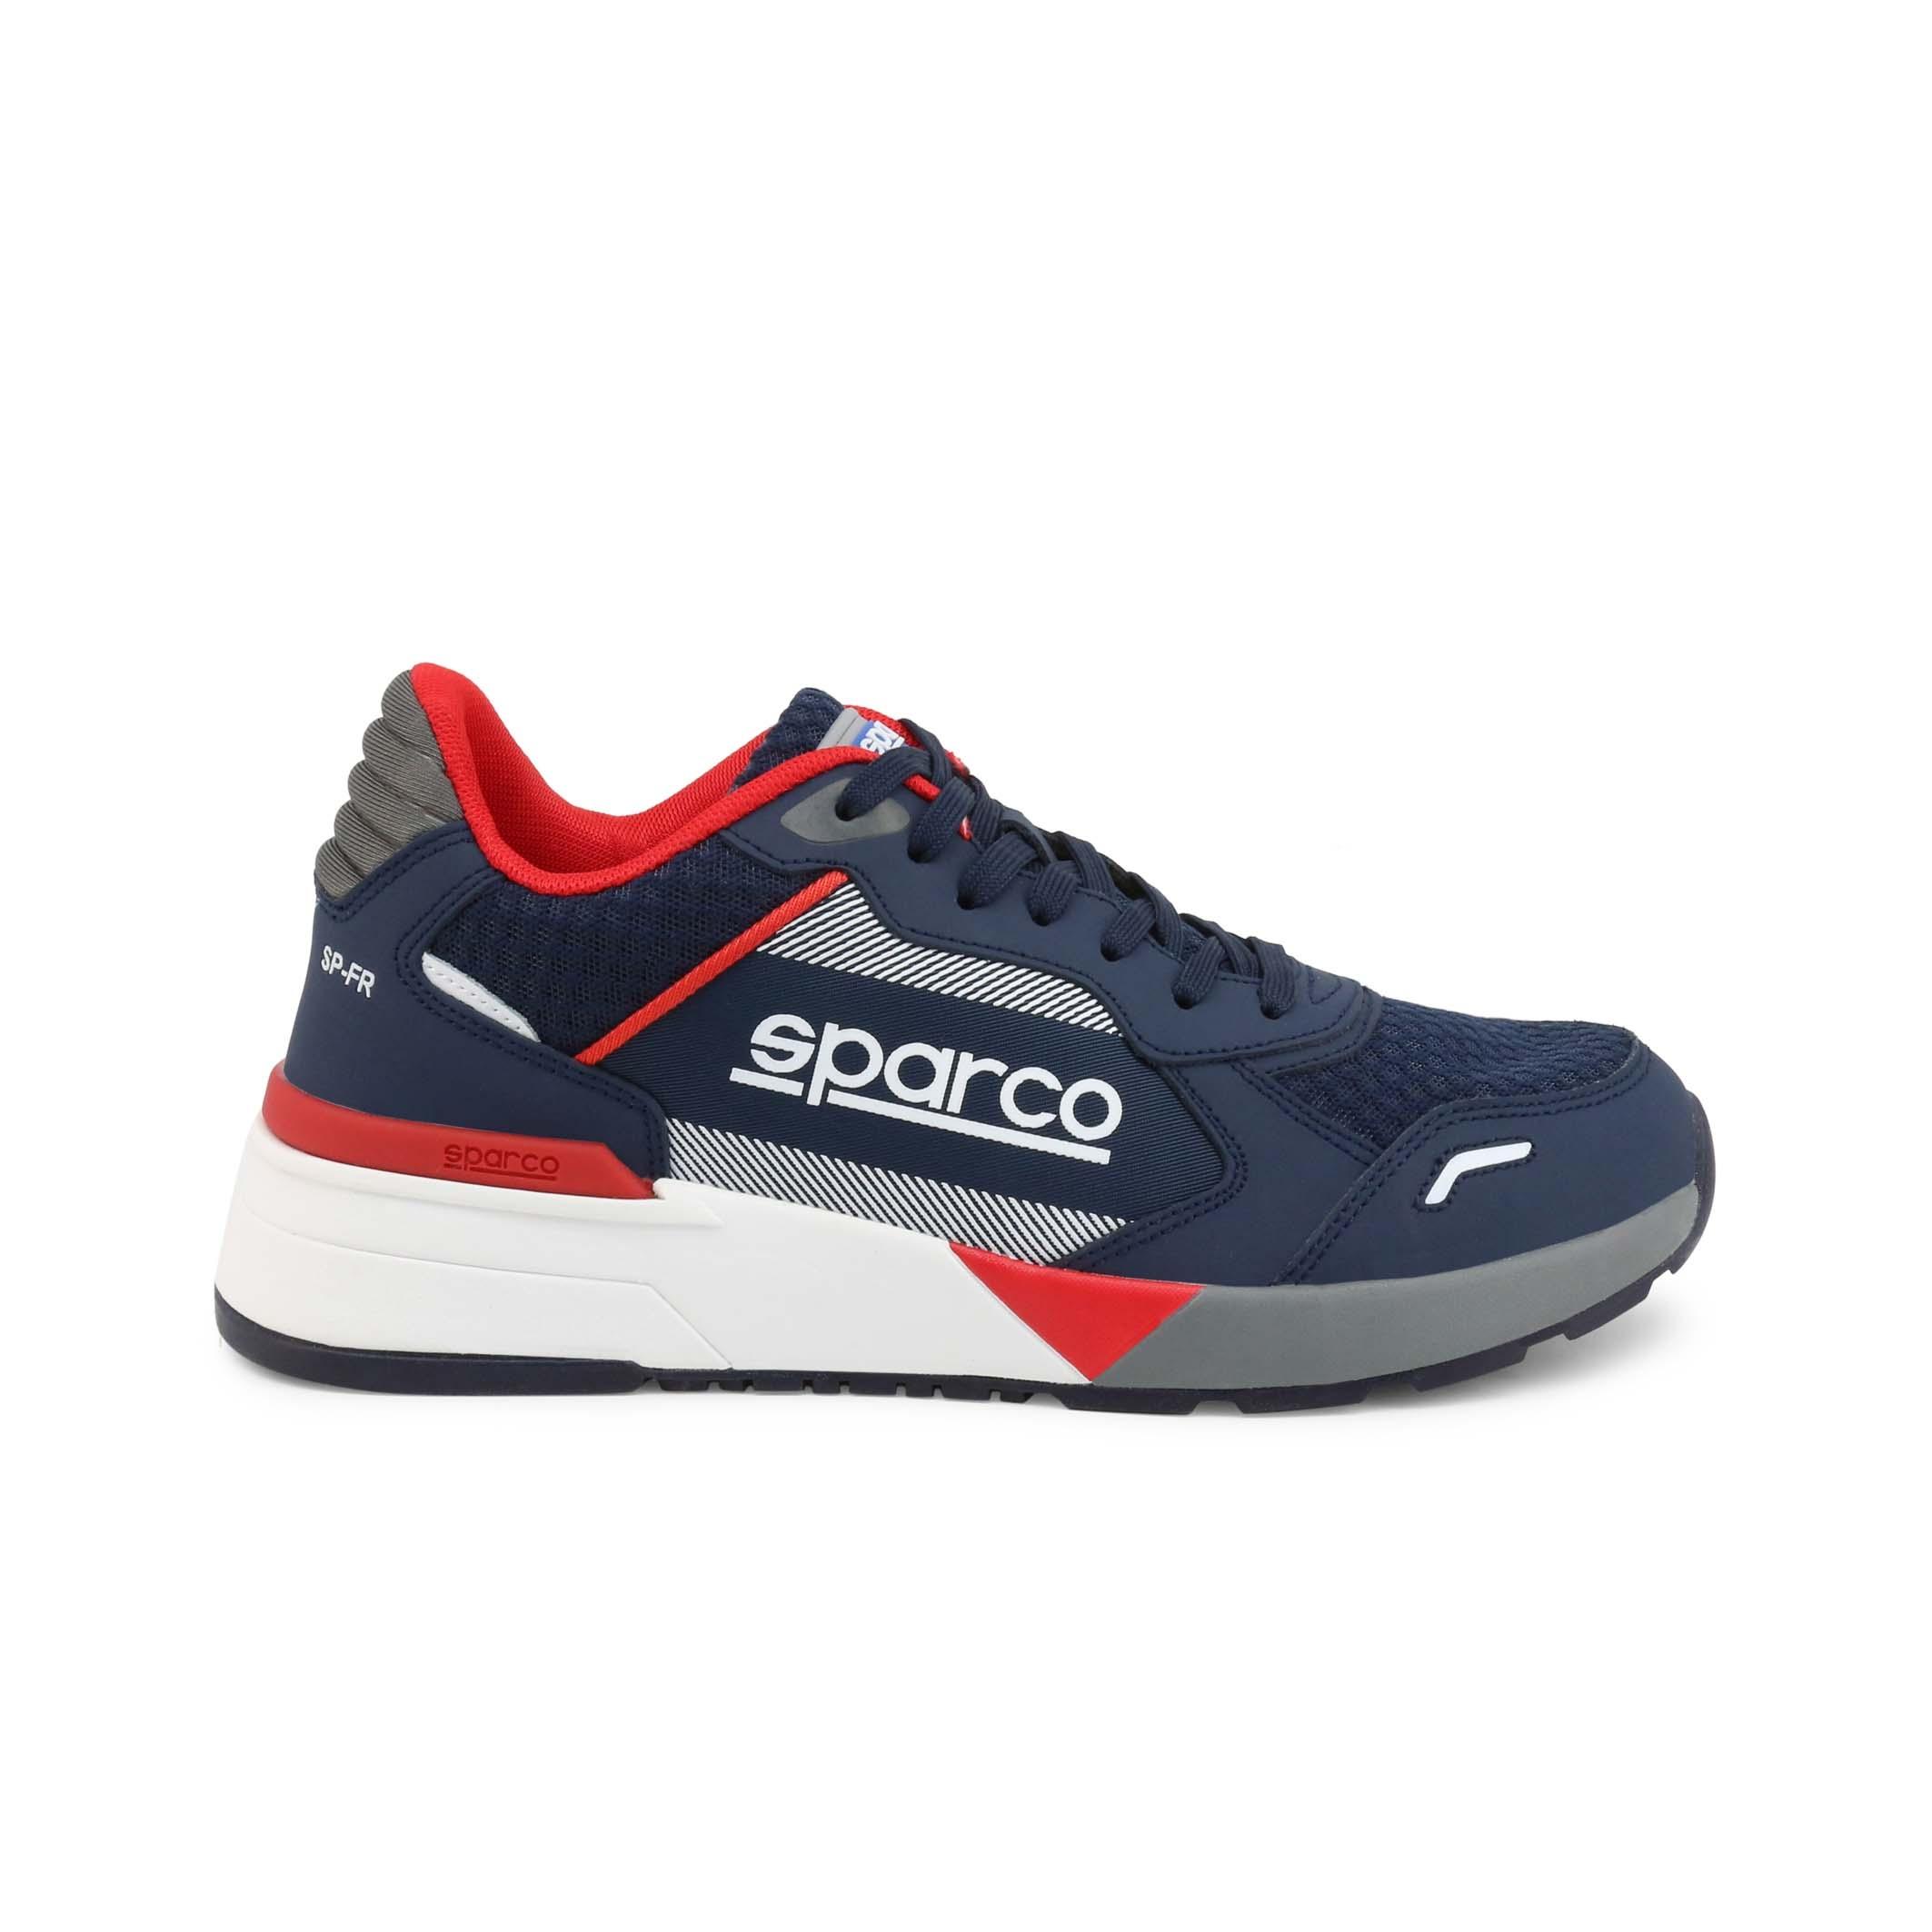 Mergi la Pantofi sport Sparco SP-FR Albastru